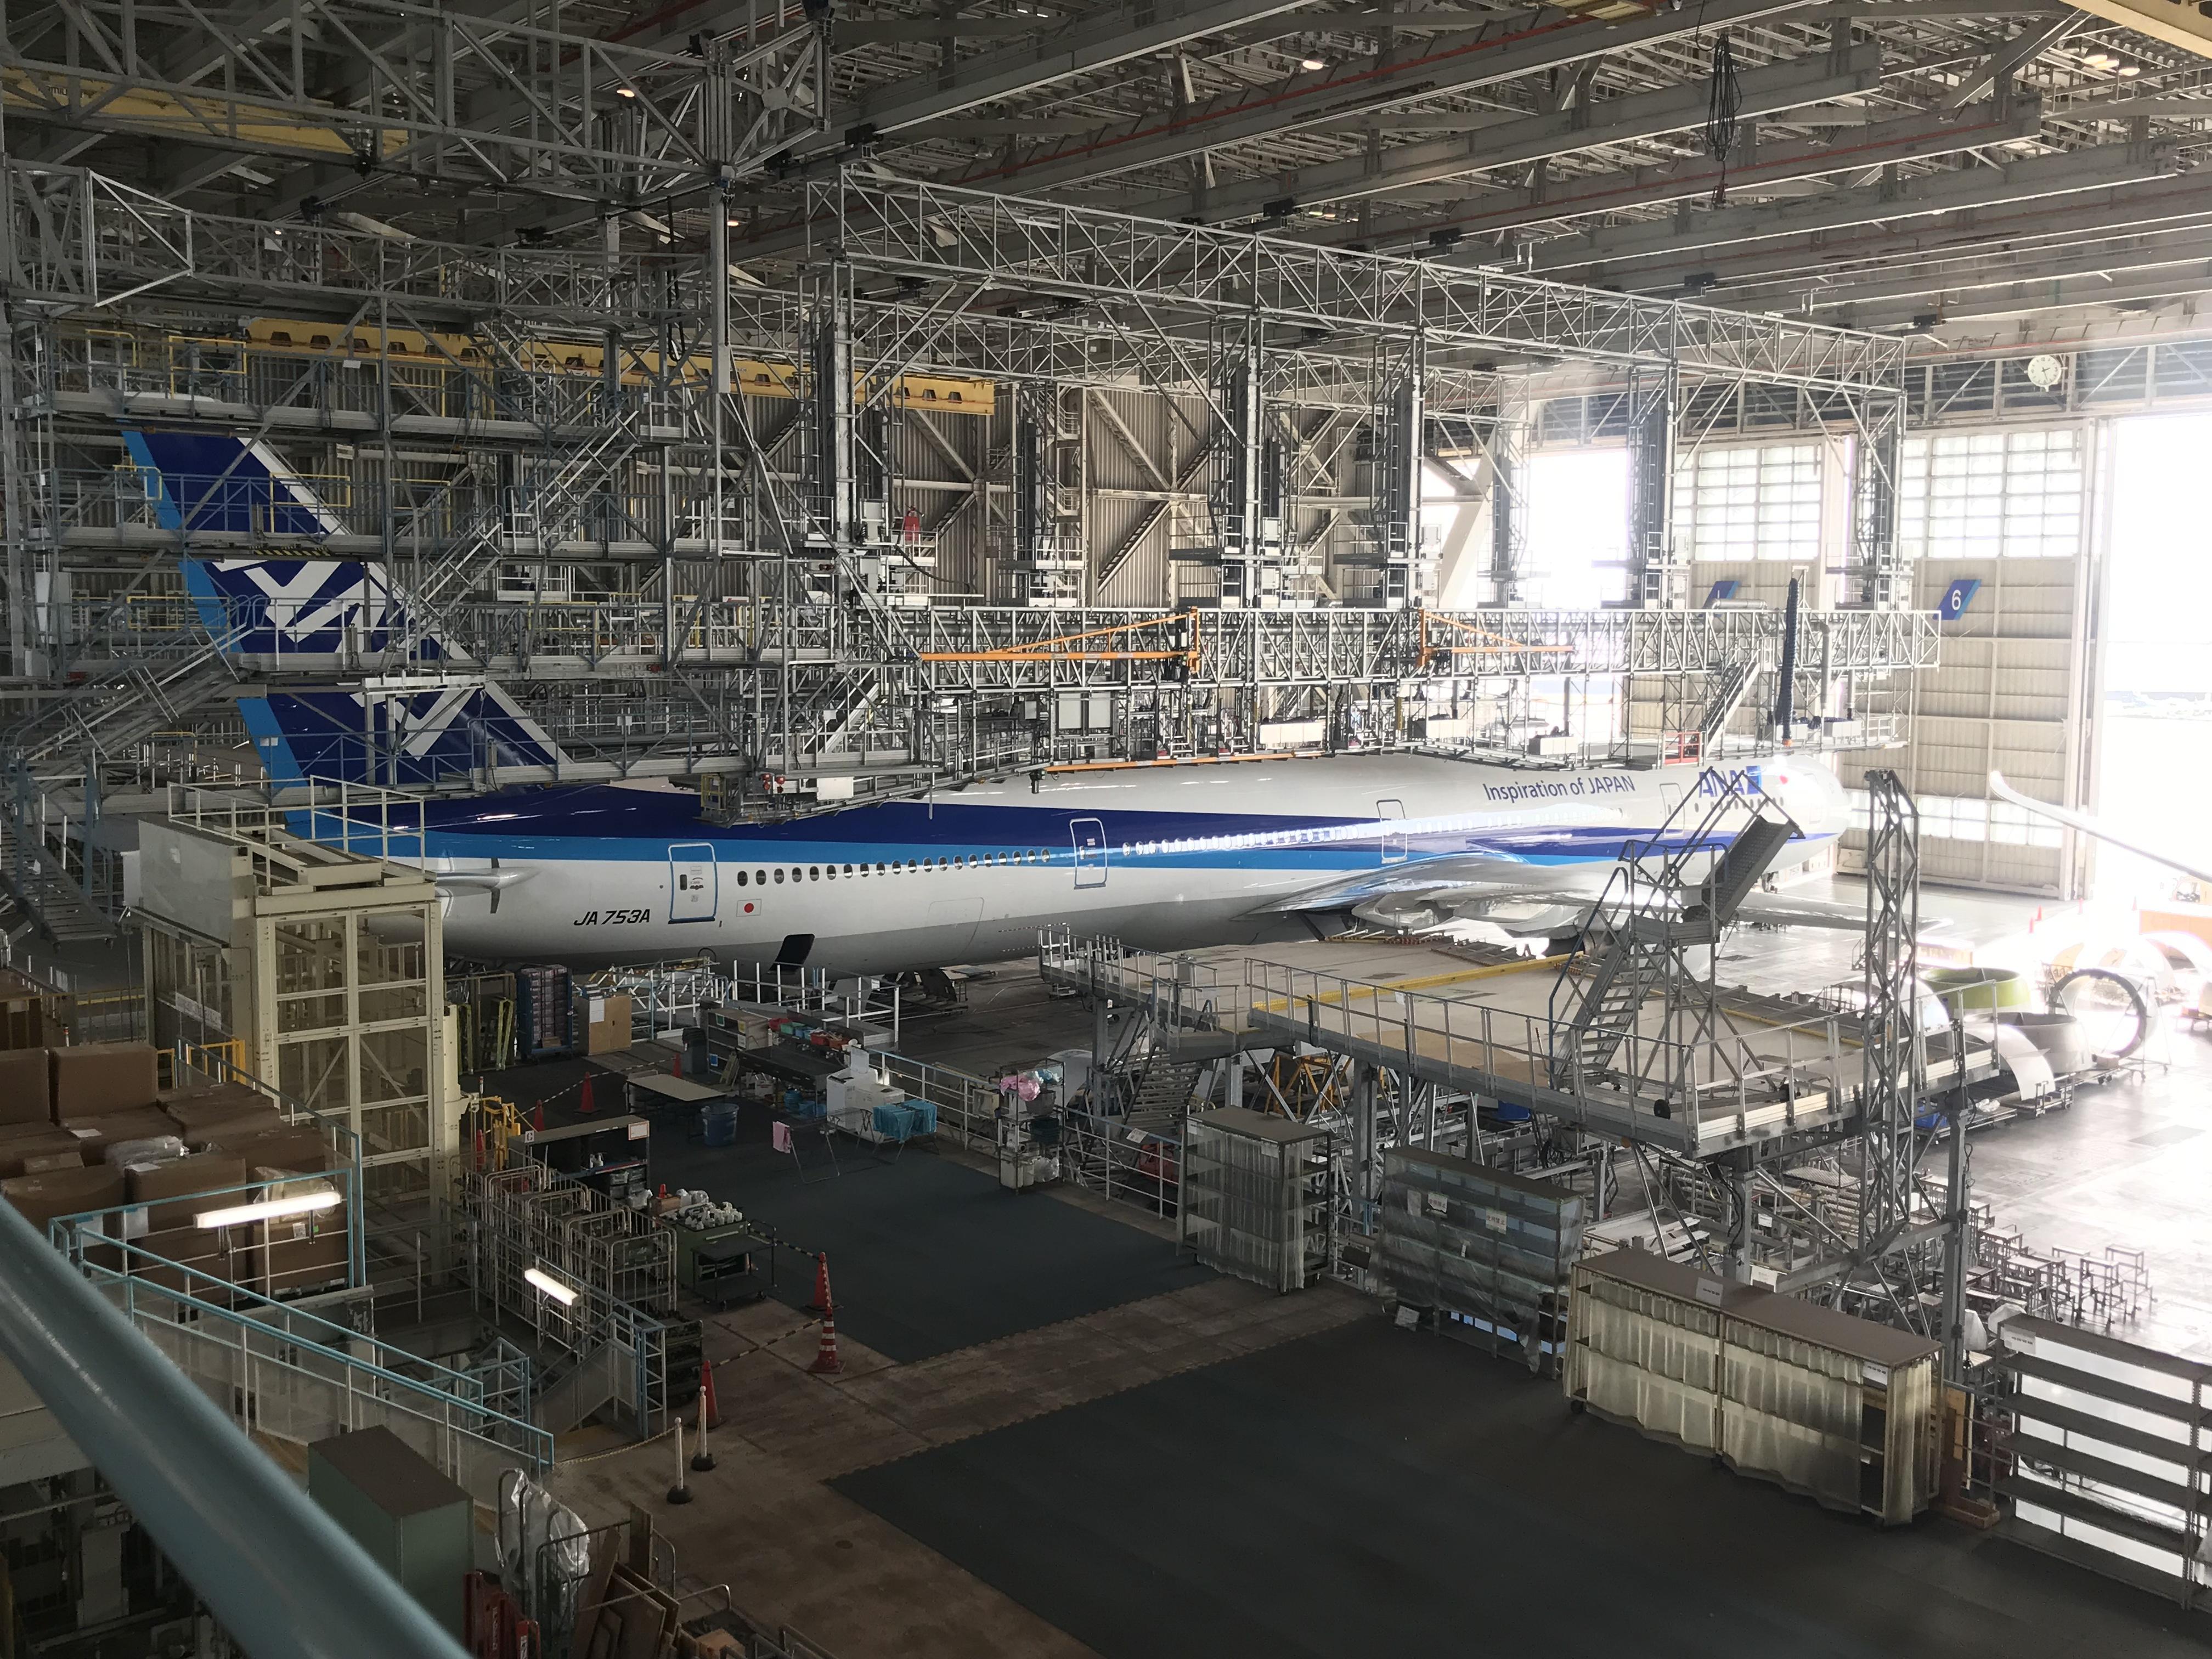 ANA機体工場見学ツアー